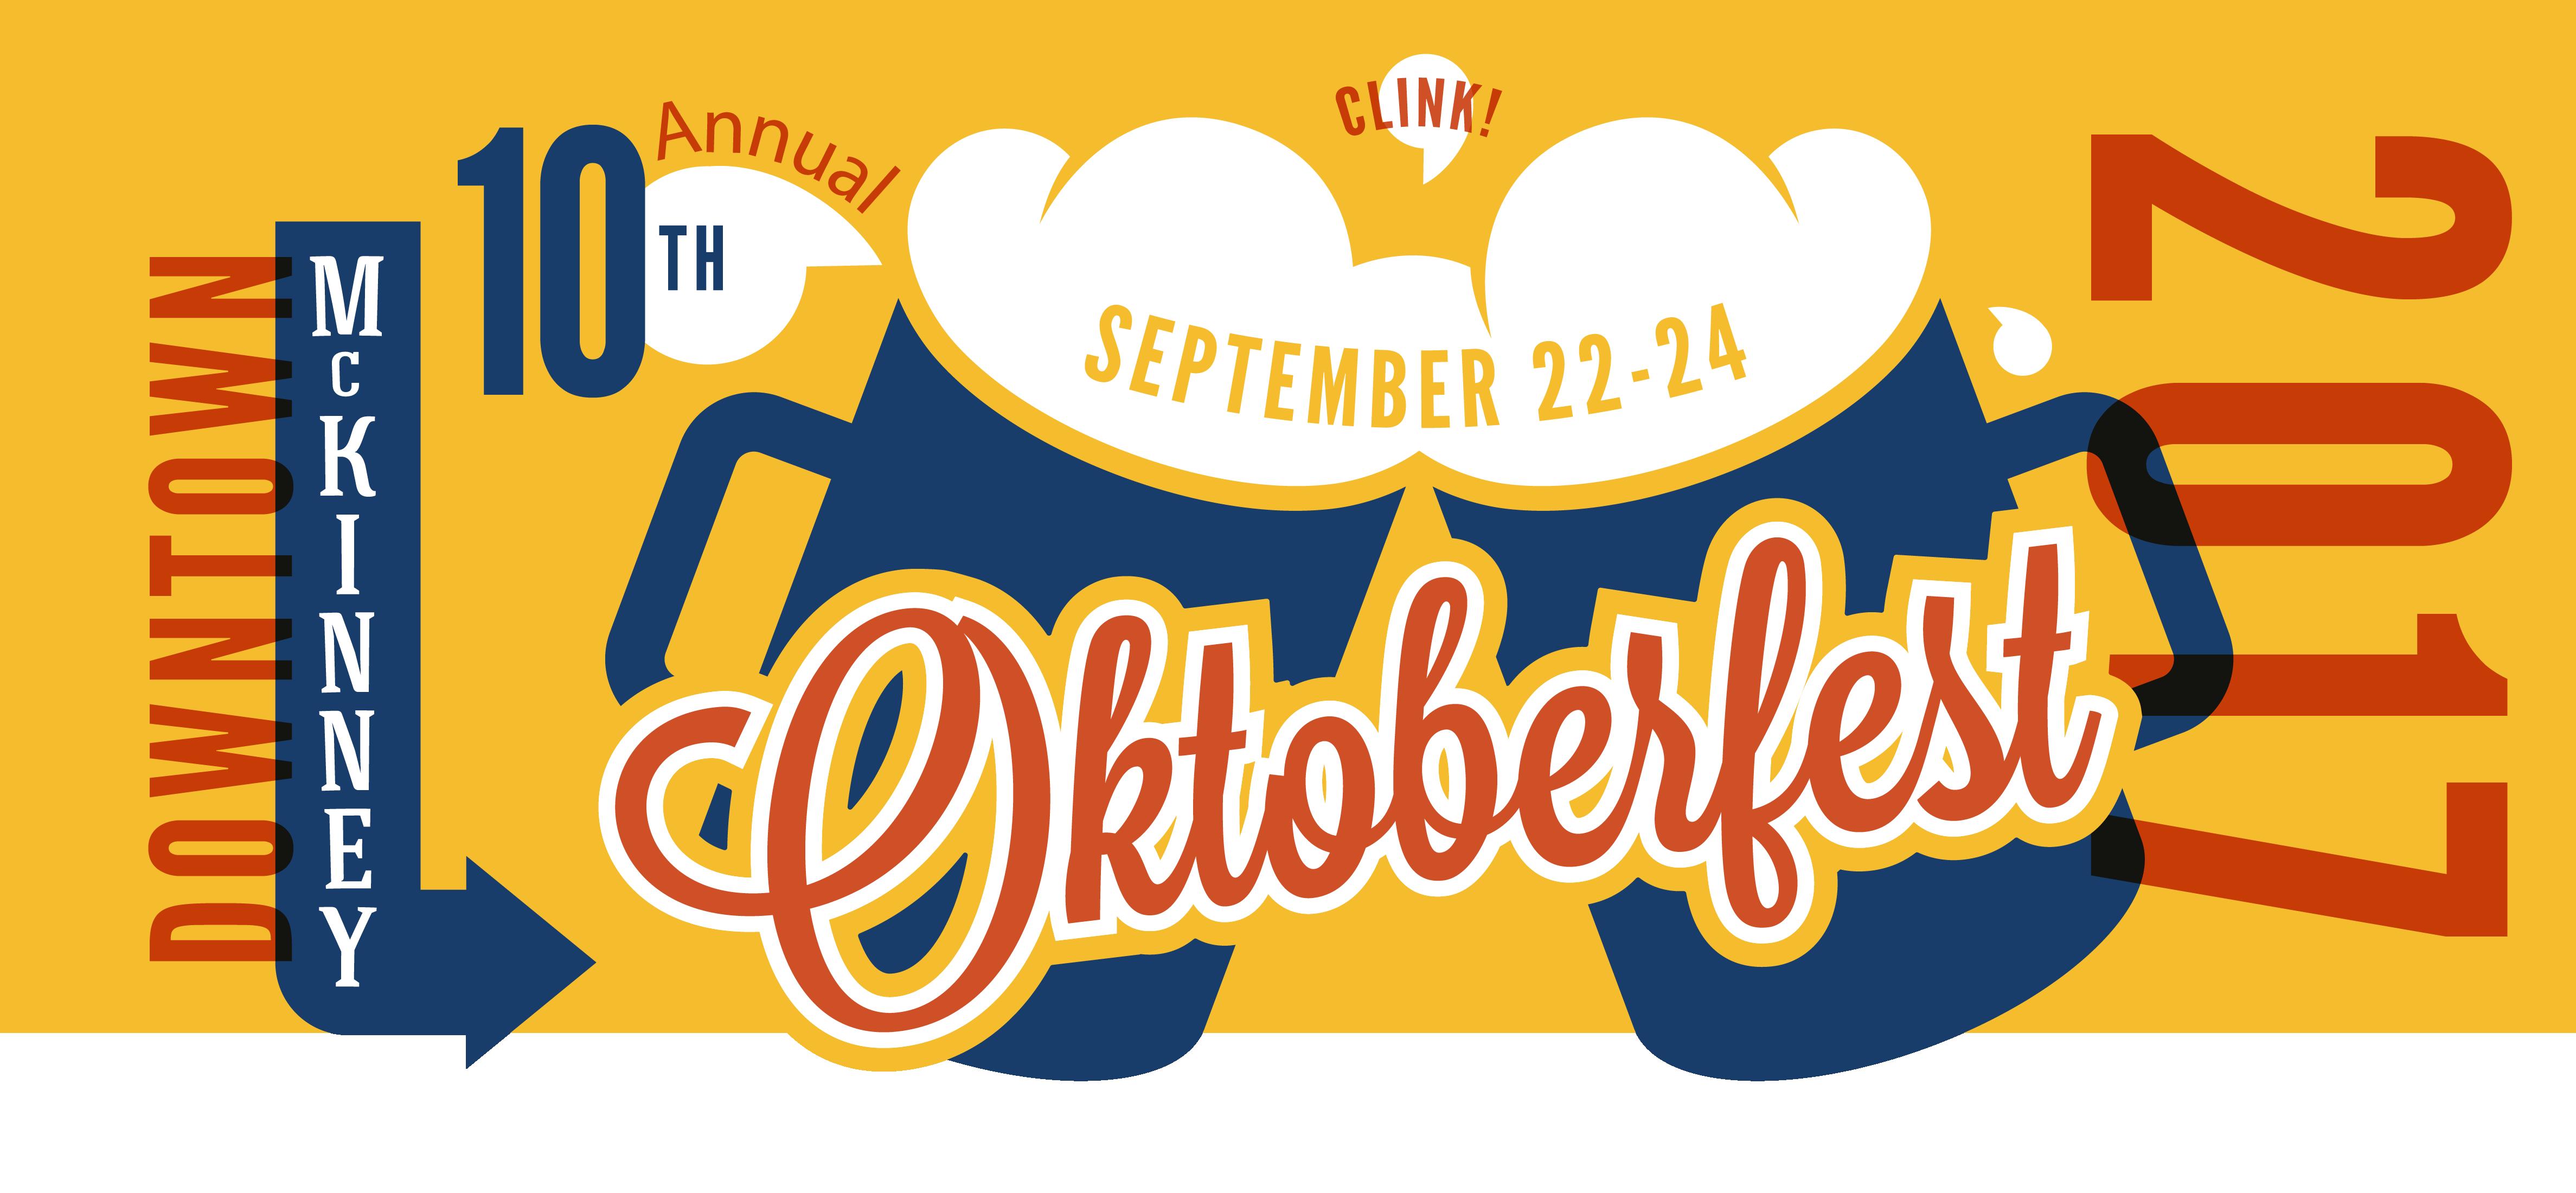 Oktoberfest wallpapers Holiday HQ Oktoberfest pictures 4750x2200